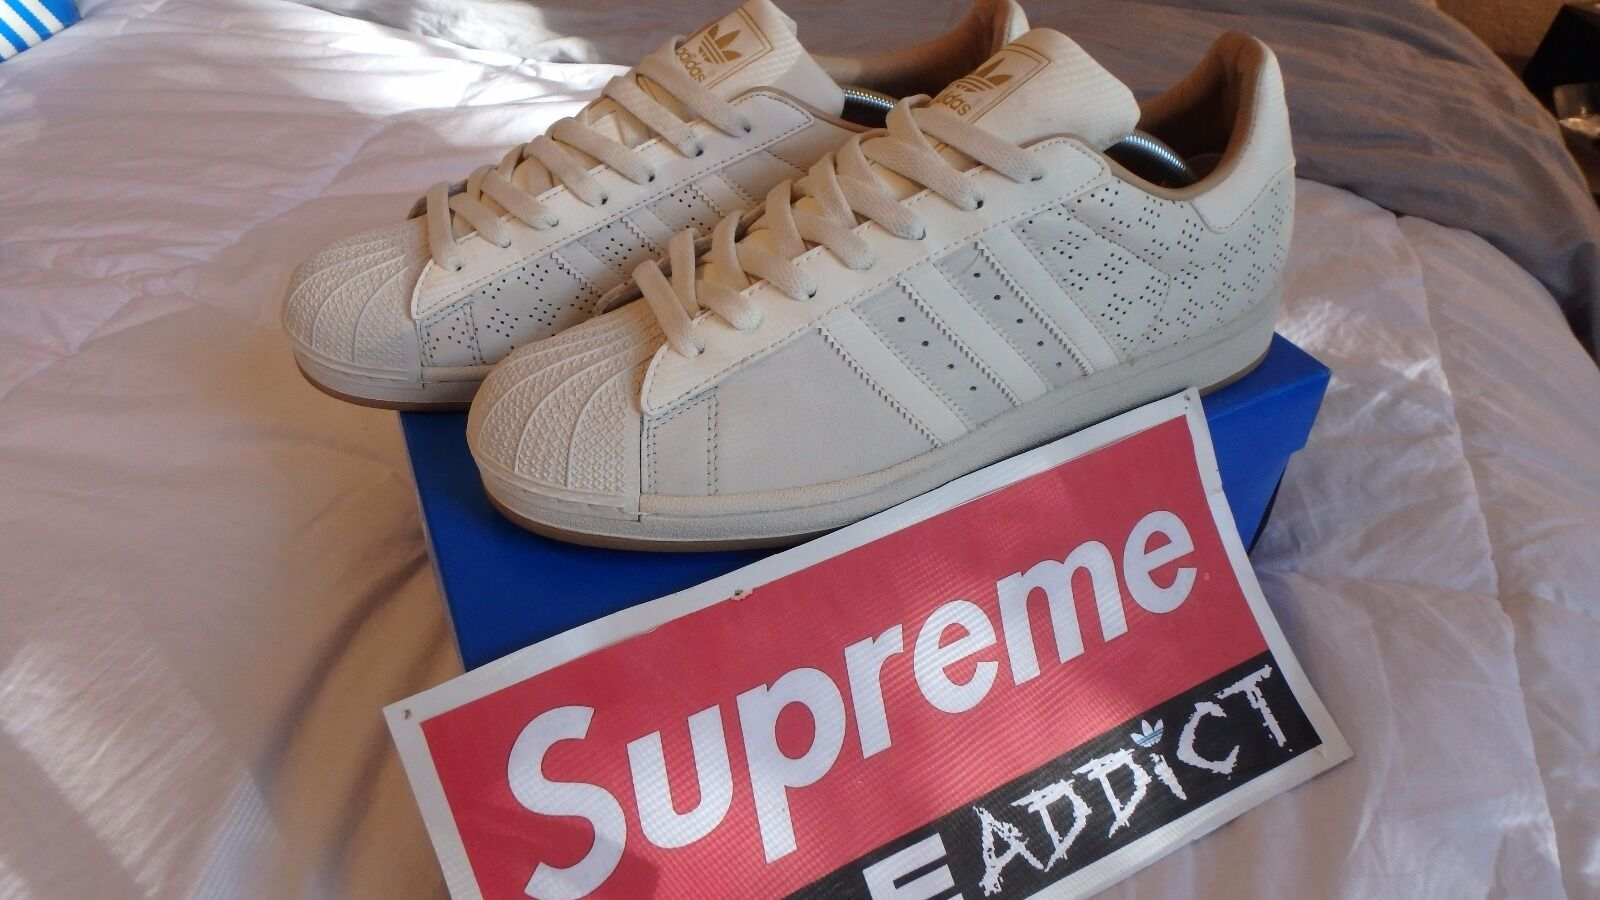 89300d14c7dd4 Adidas Superstar 1 Size 11.5 Art 662836 Date 07 08 ncmmyw5006 ...